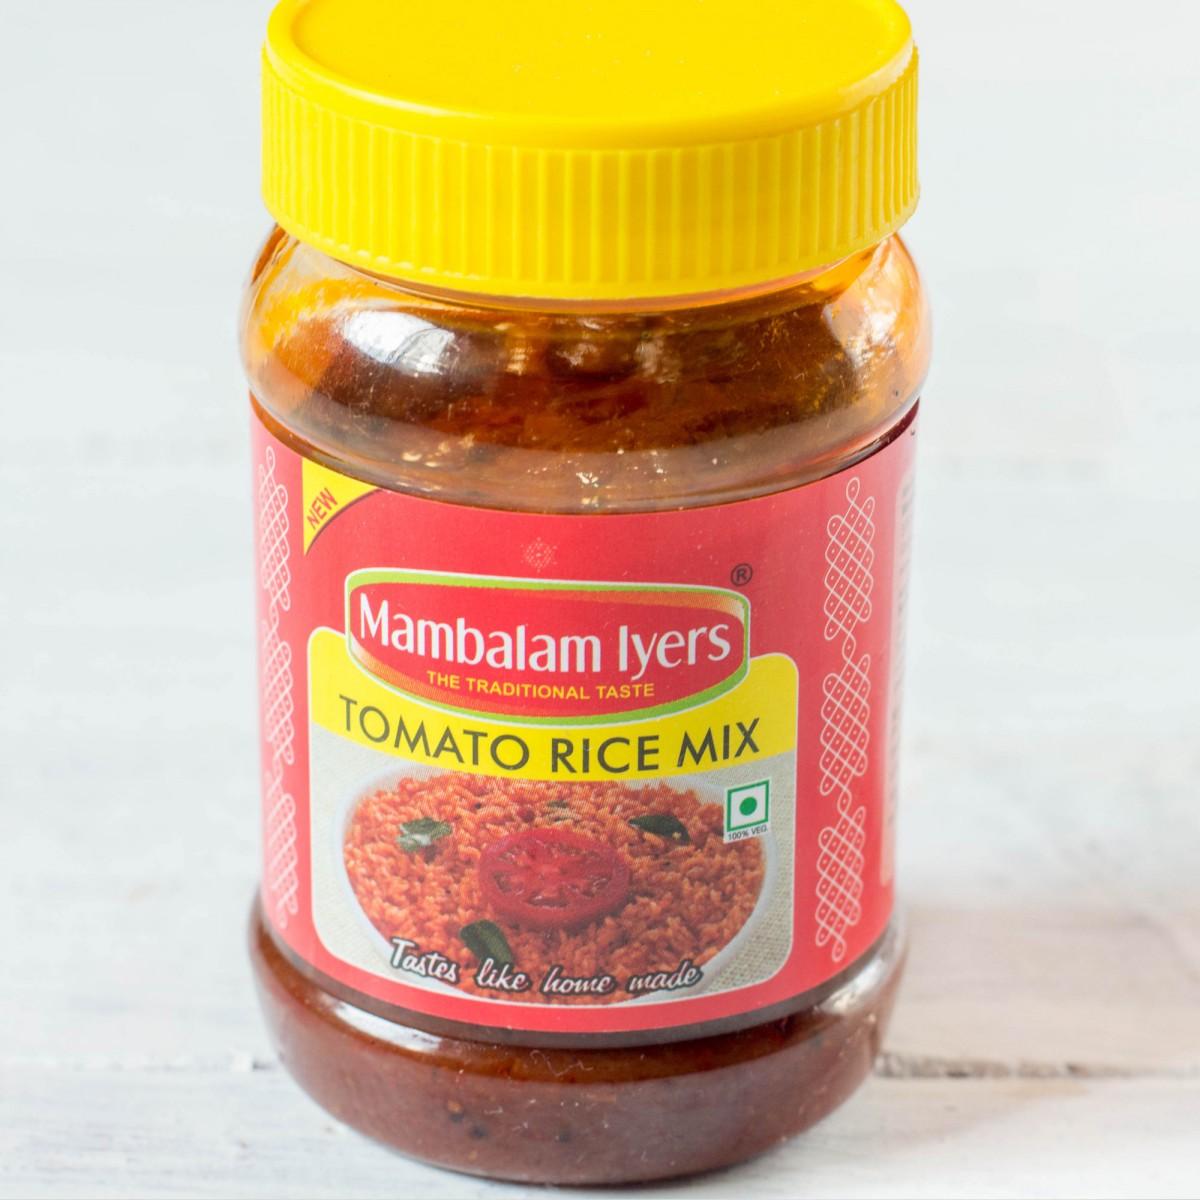 Mambalam Iyers Mix Tomato Rice